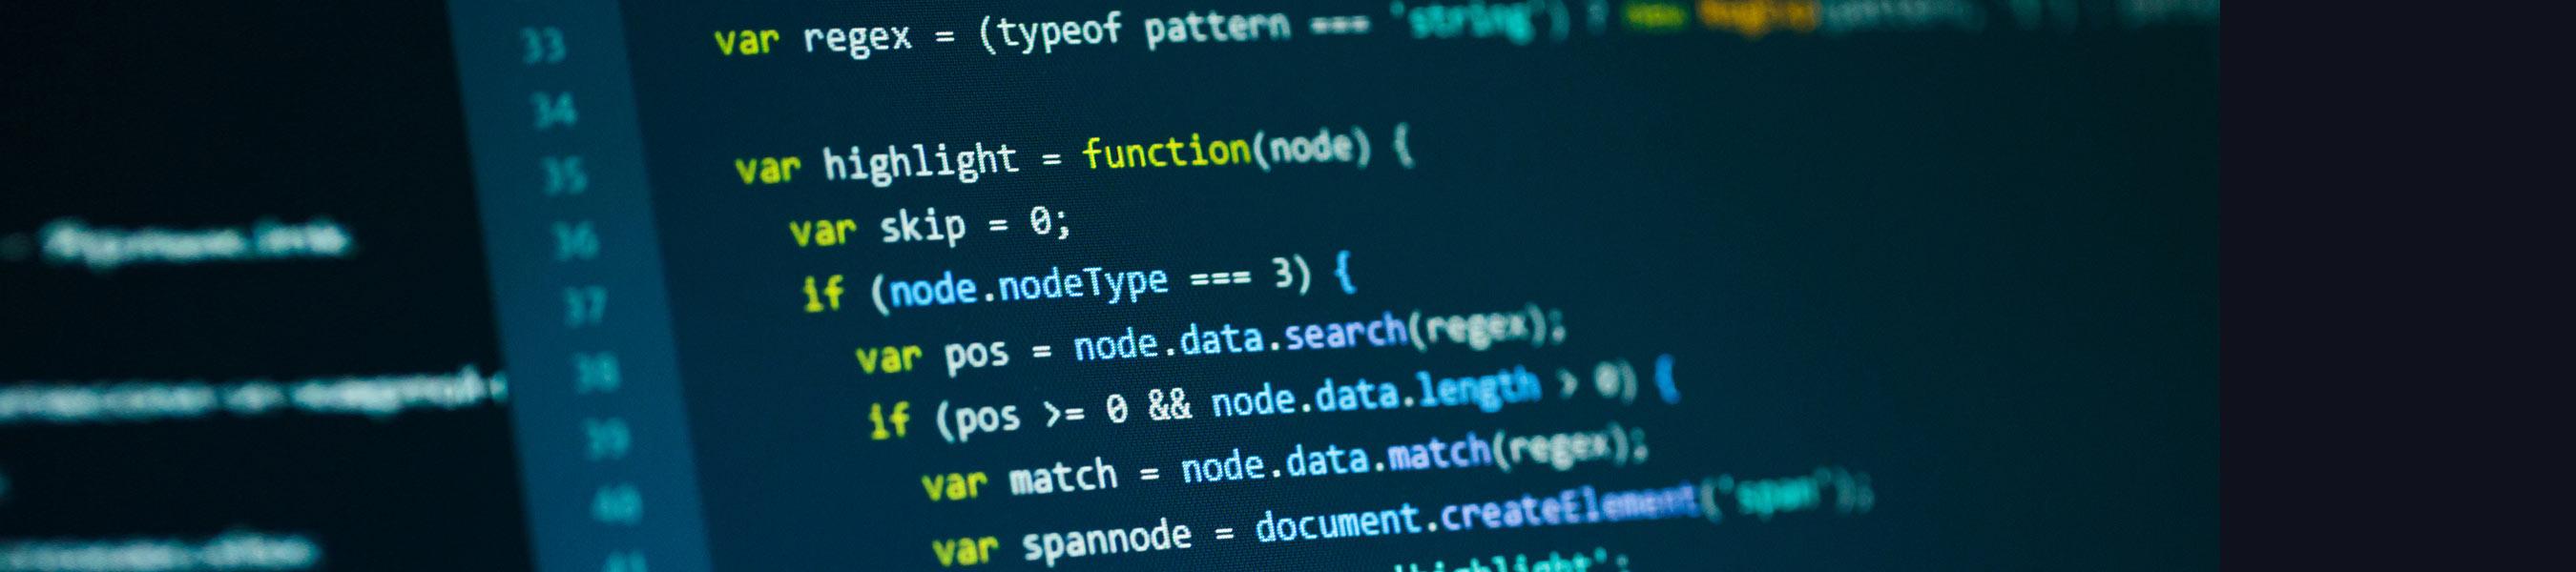 Backend-Entwickler Webanwendung (m/w/d)